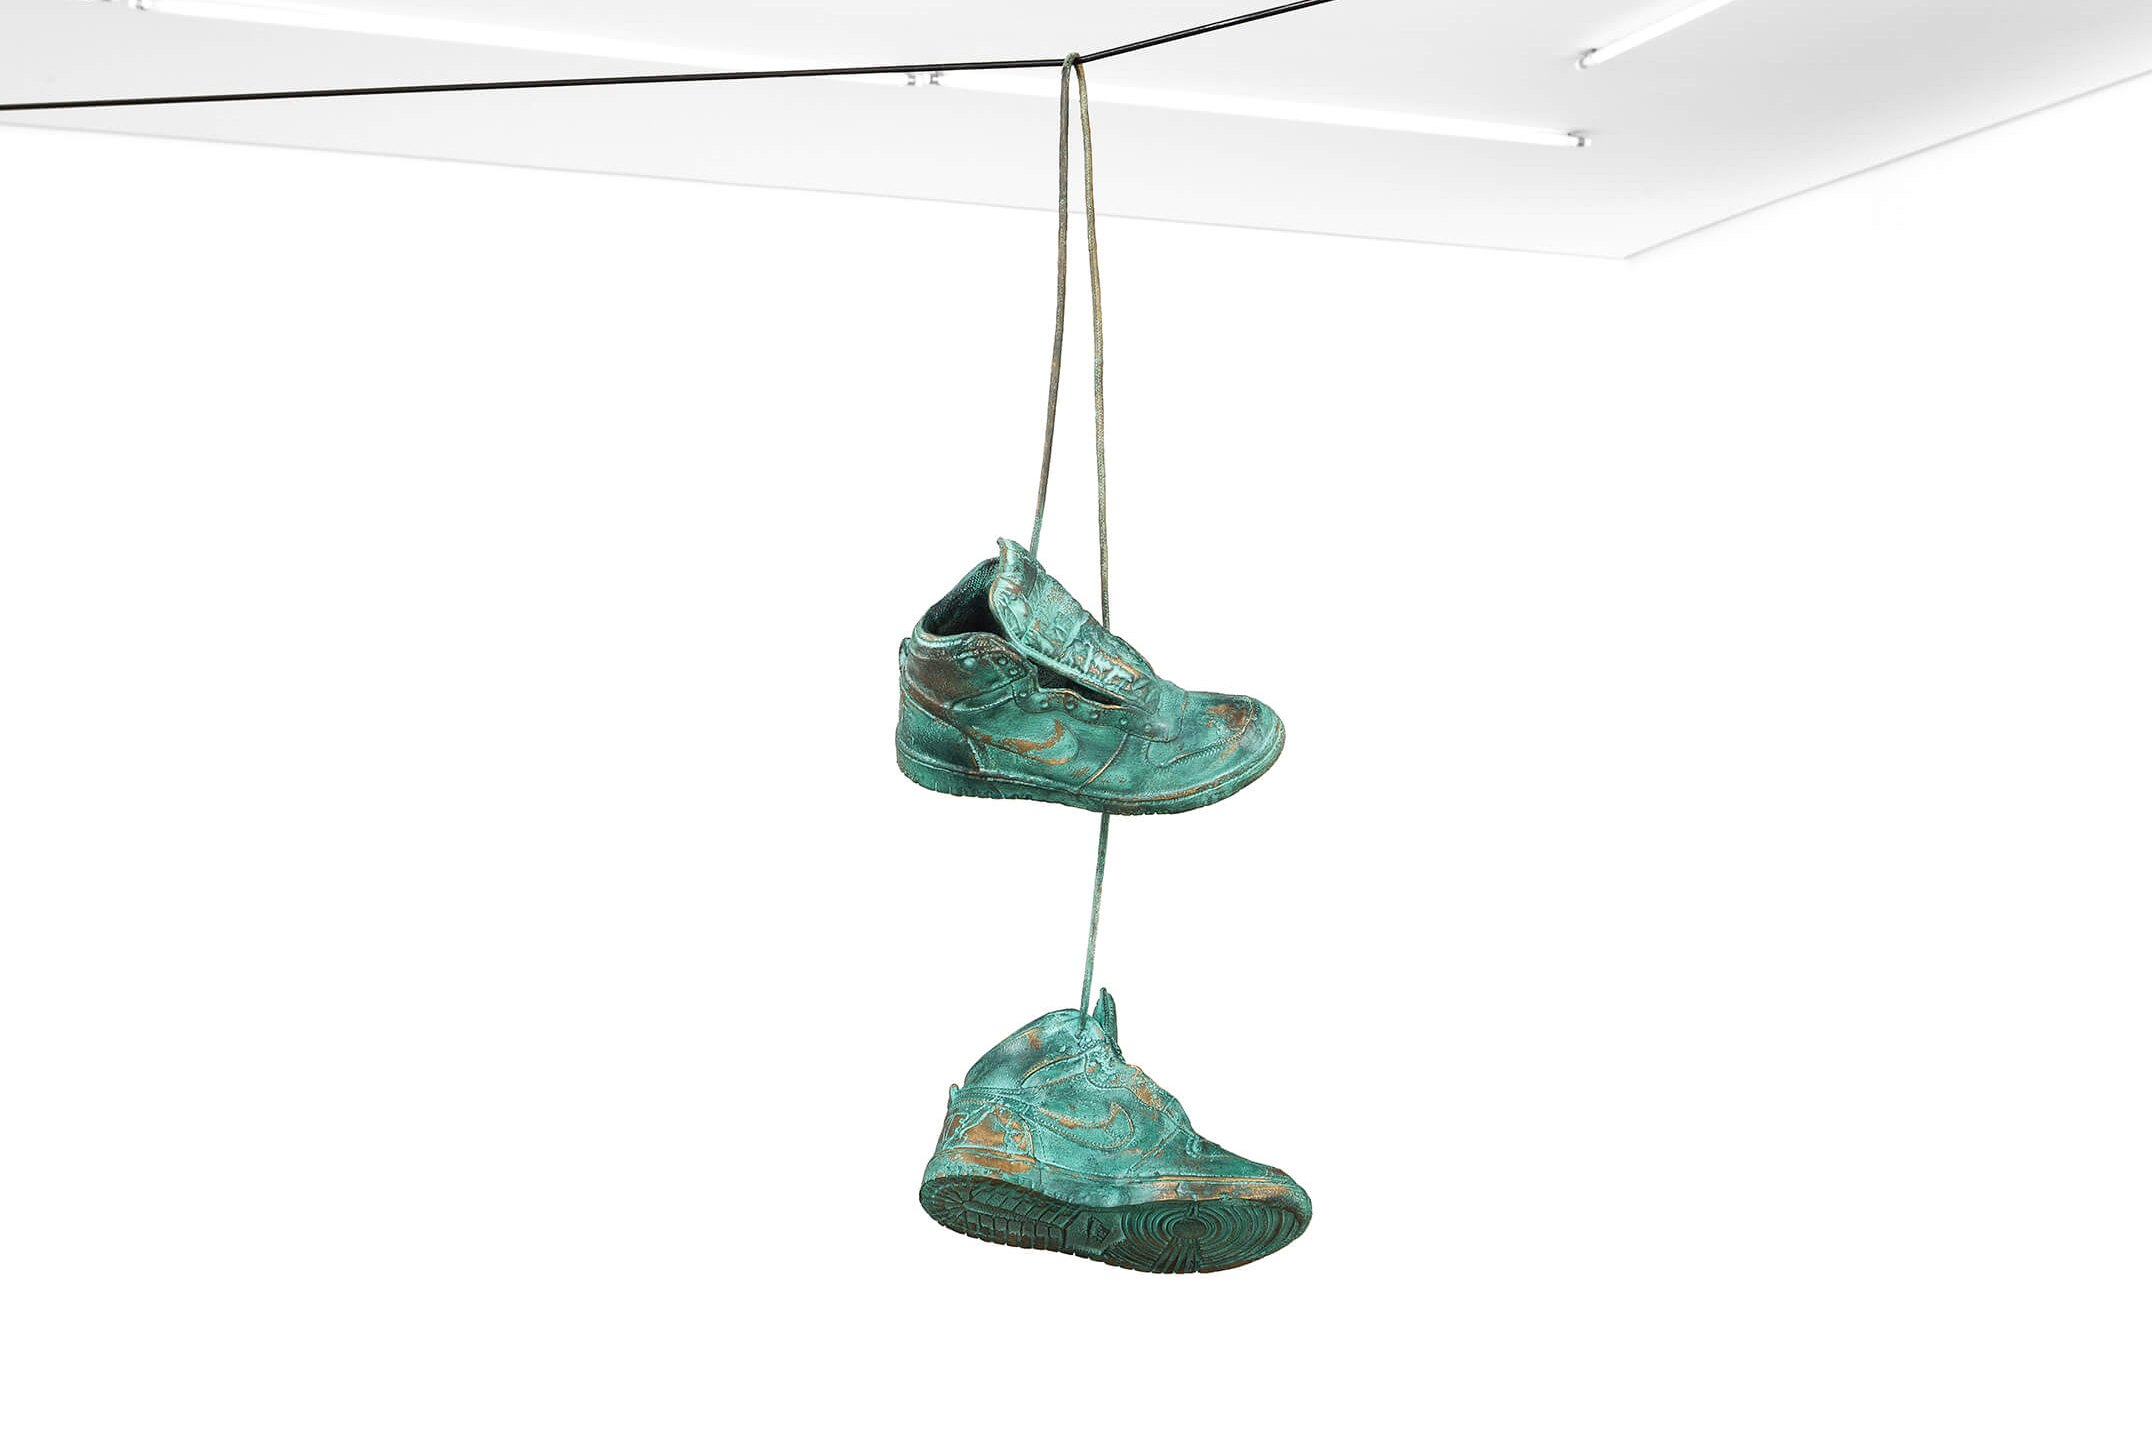 Haroon Gunn-Salie<em>, On the line,</em>2016,pair of shoes bronze plated,78 × 32 × 29 cm - Mendes Wood DM